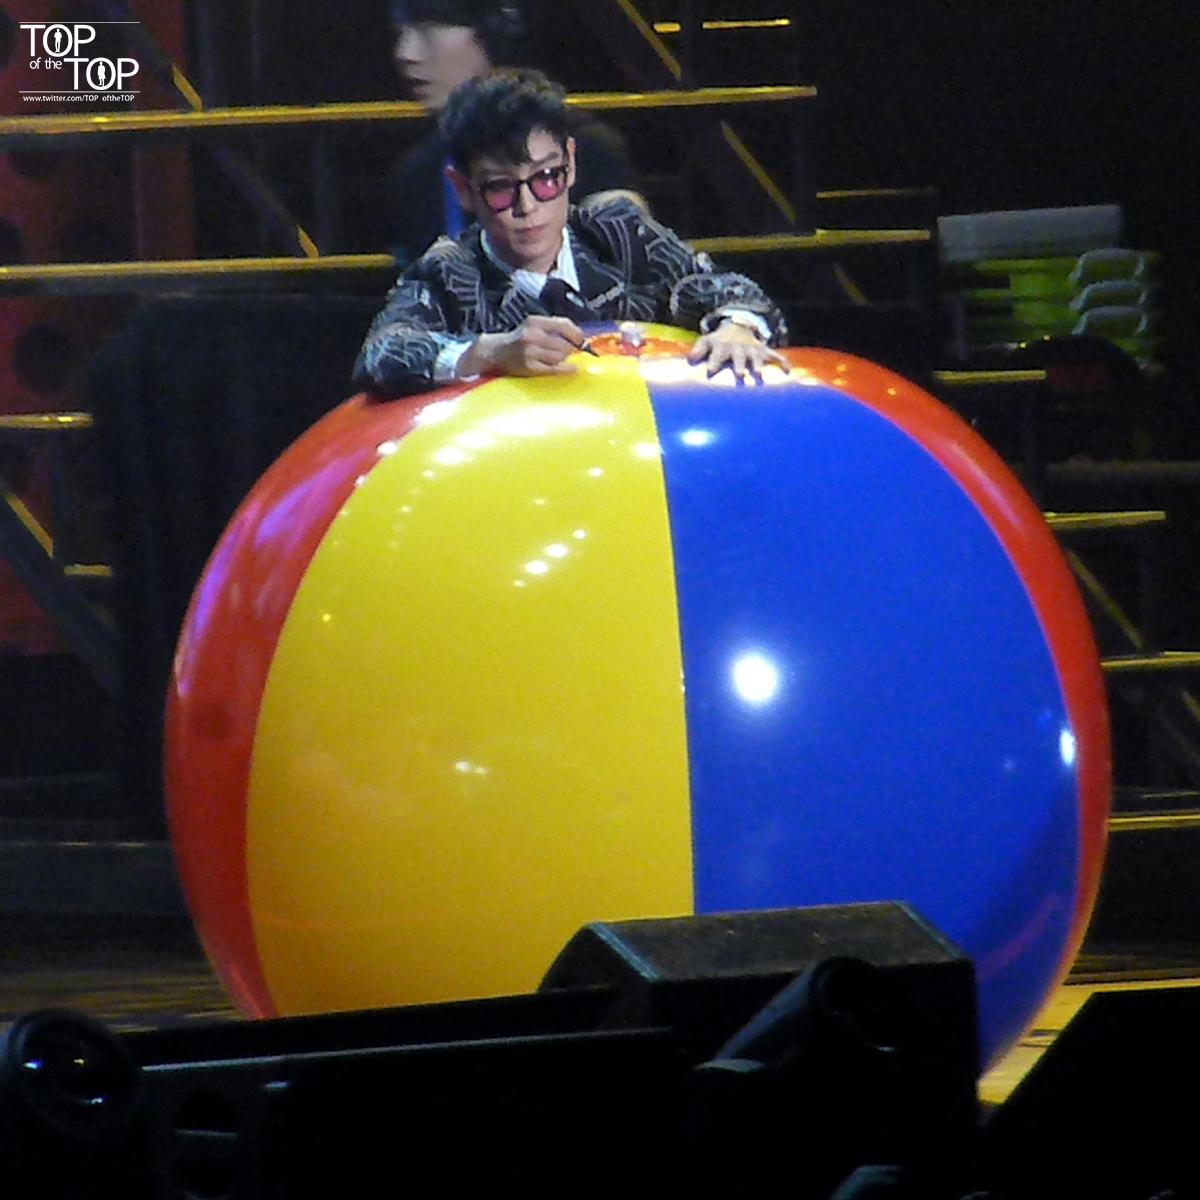 TOP_oftheTOP-BIGBANG_FM_Beijing_Day3_2016-07-17_04